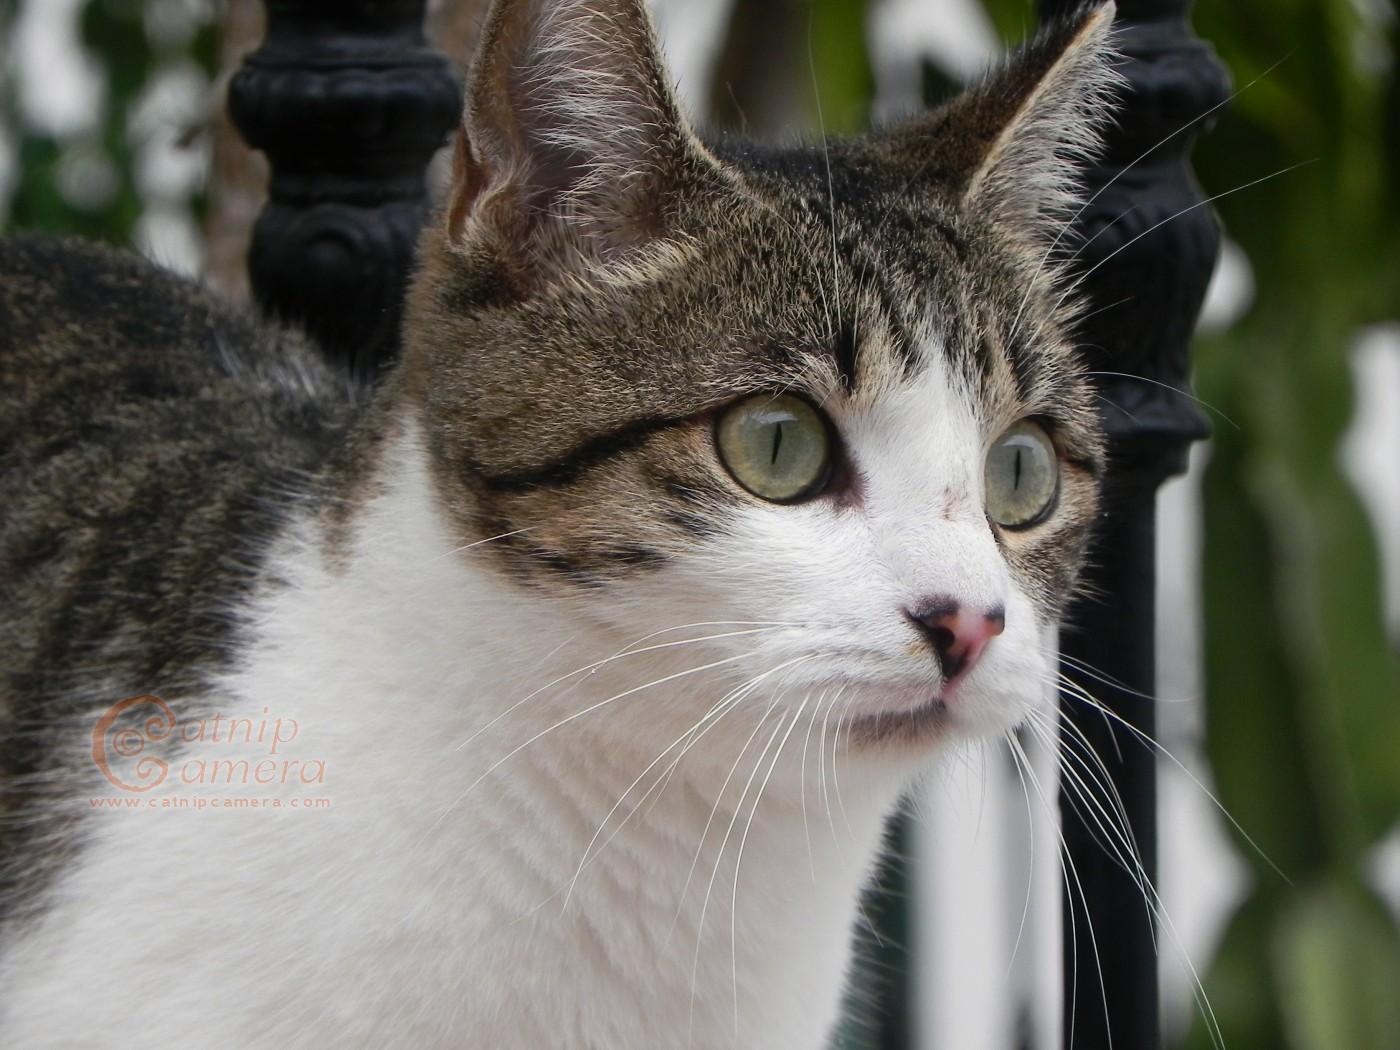 2016-yili-komik-kediler-patiliyo-15